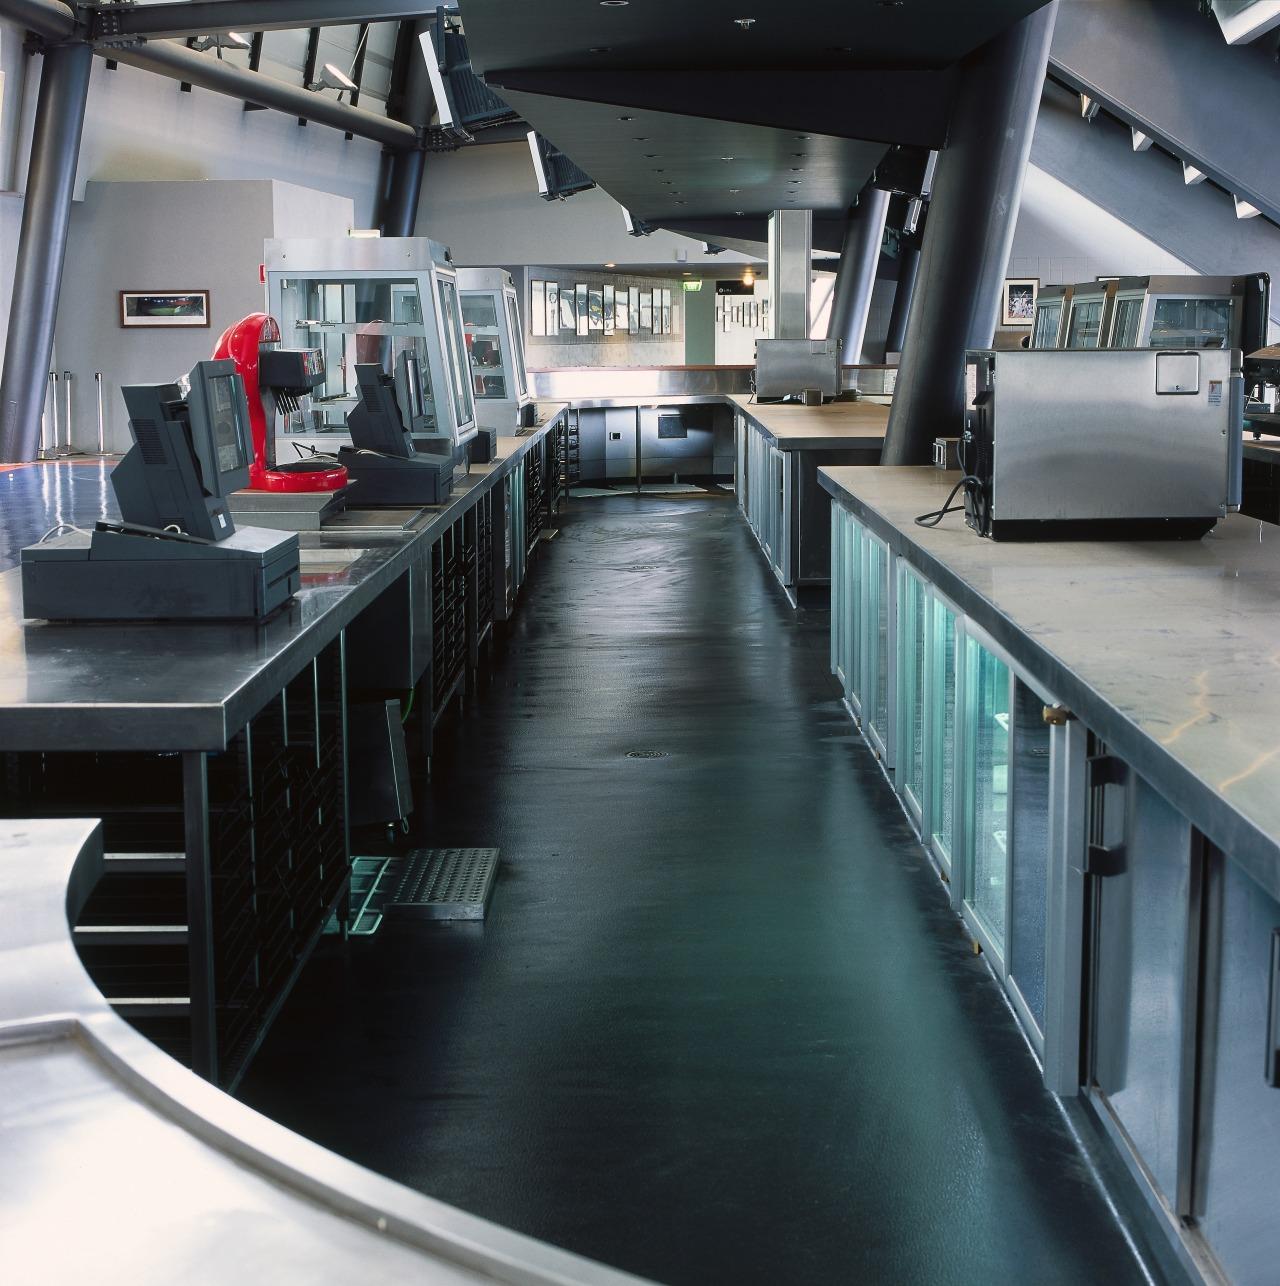 Bar and kitchen hospitality area featuring vinyl flooring. floor, black, gray